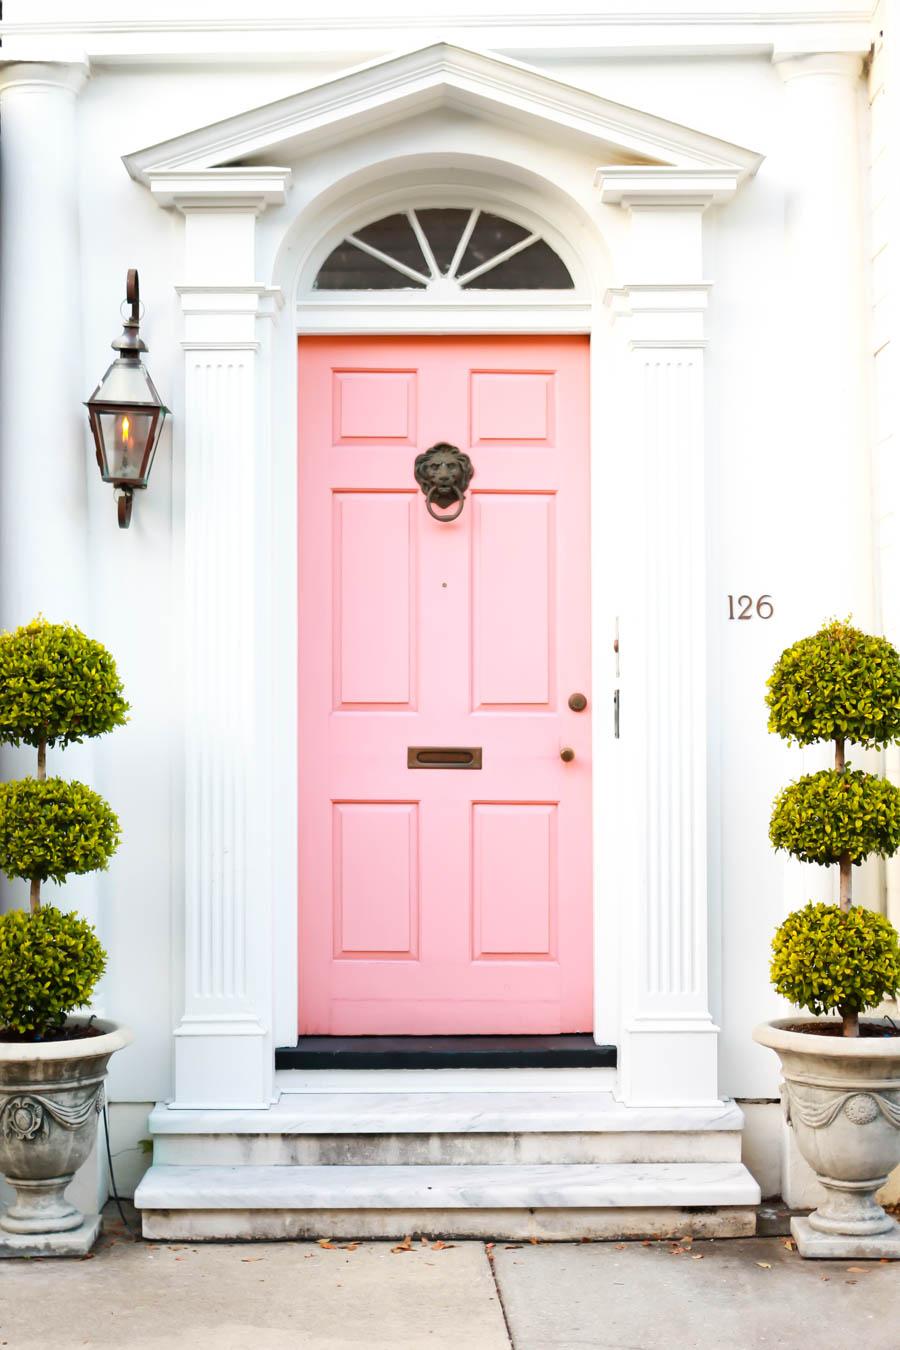 Charleston, South Carolina Travel Guide | A Married Adventure